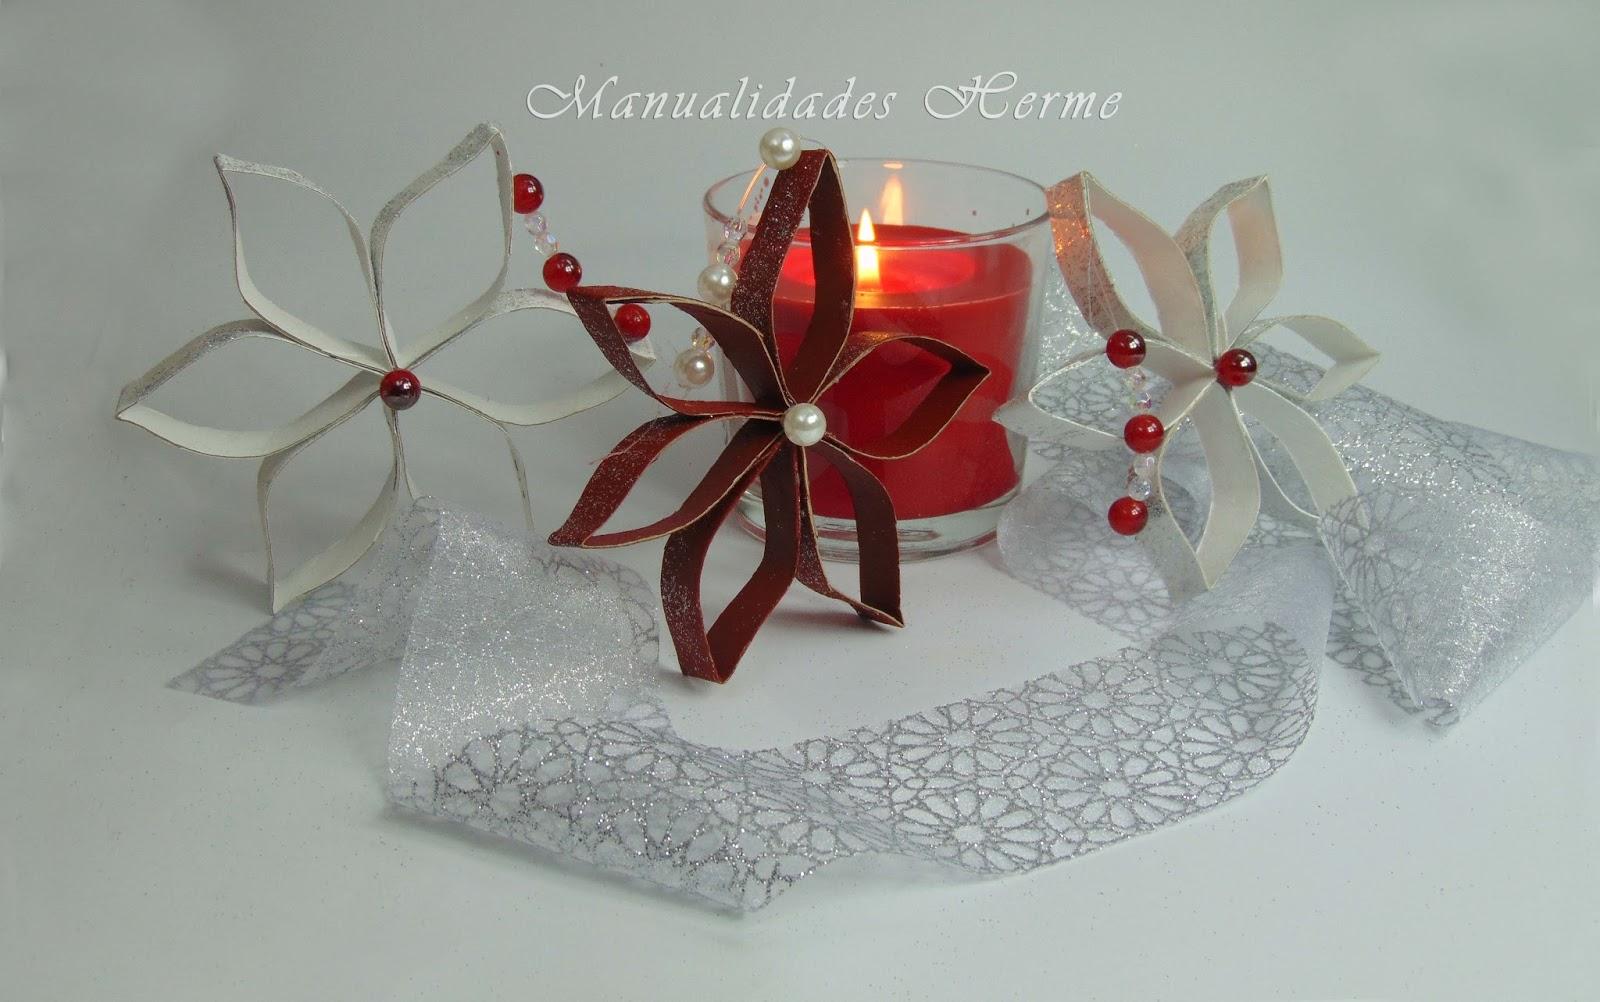 Manualidades herme hacer adorno navide o reciclaje estrella for Como hacer adornos para navidad